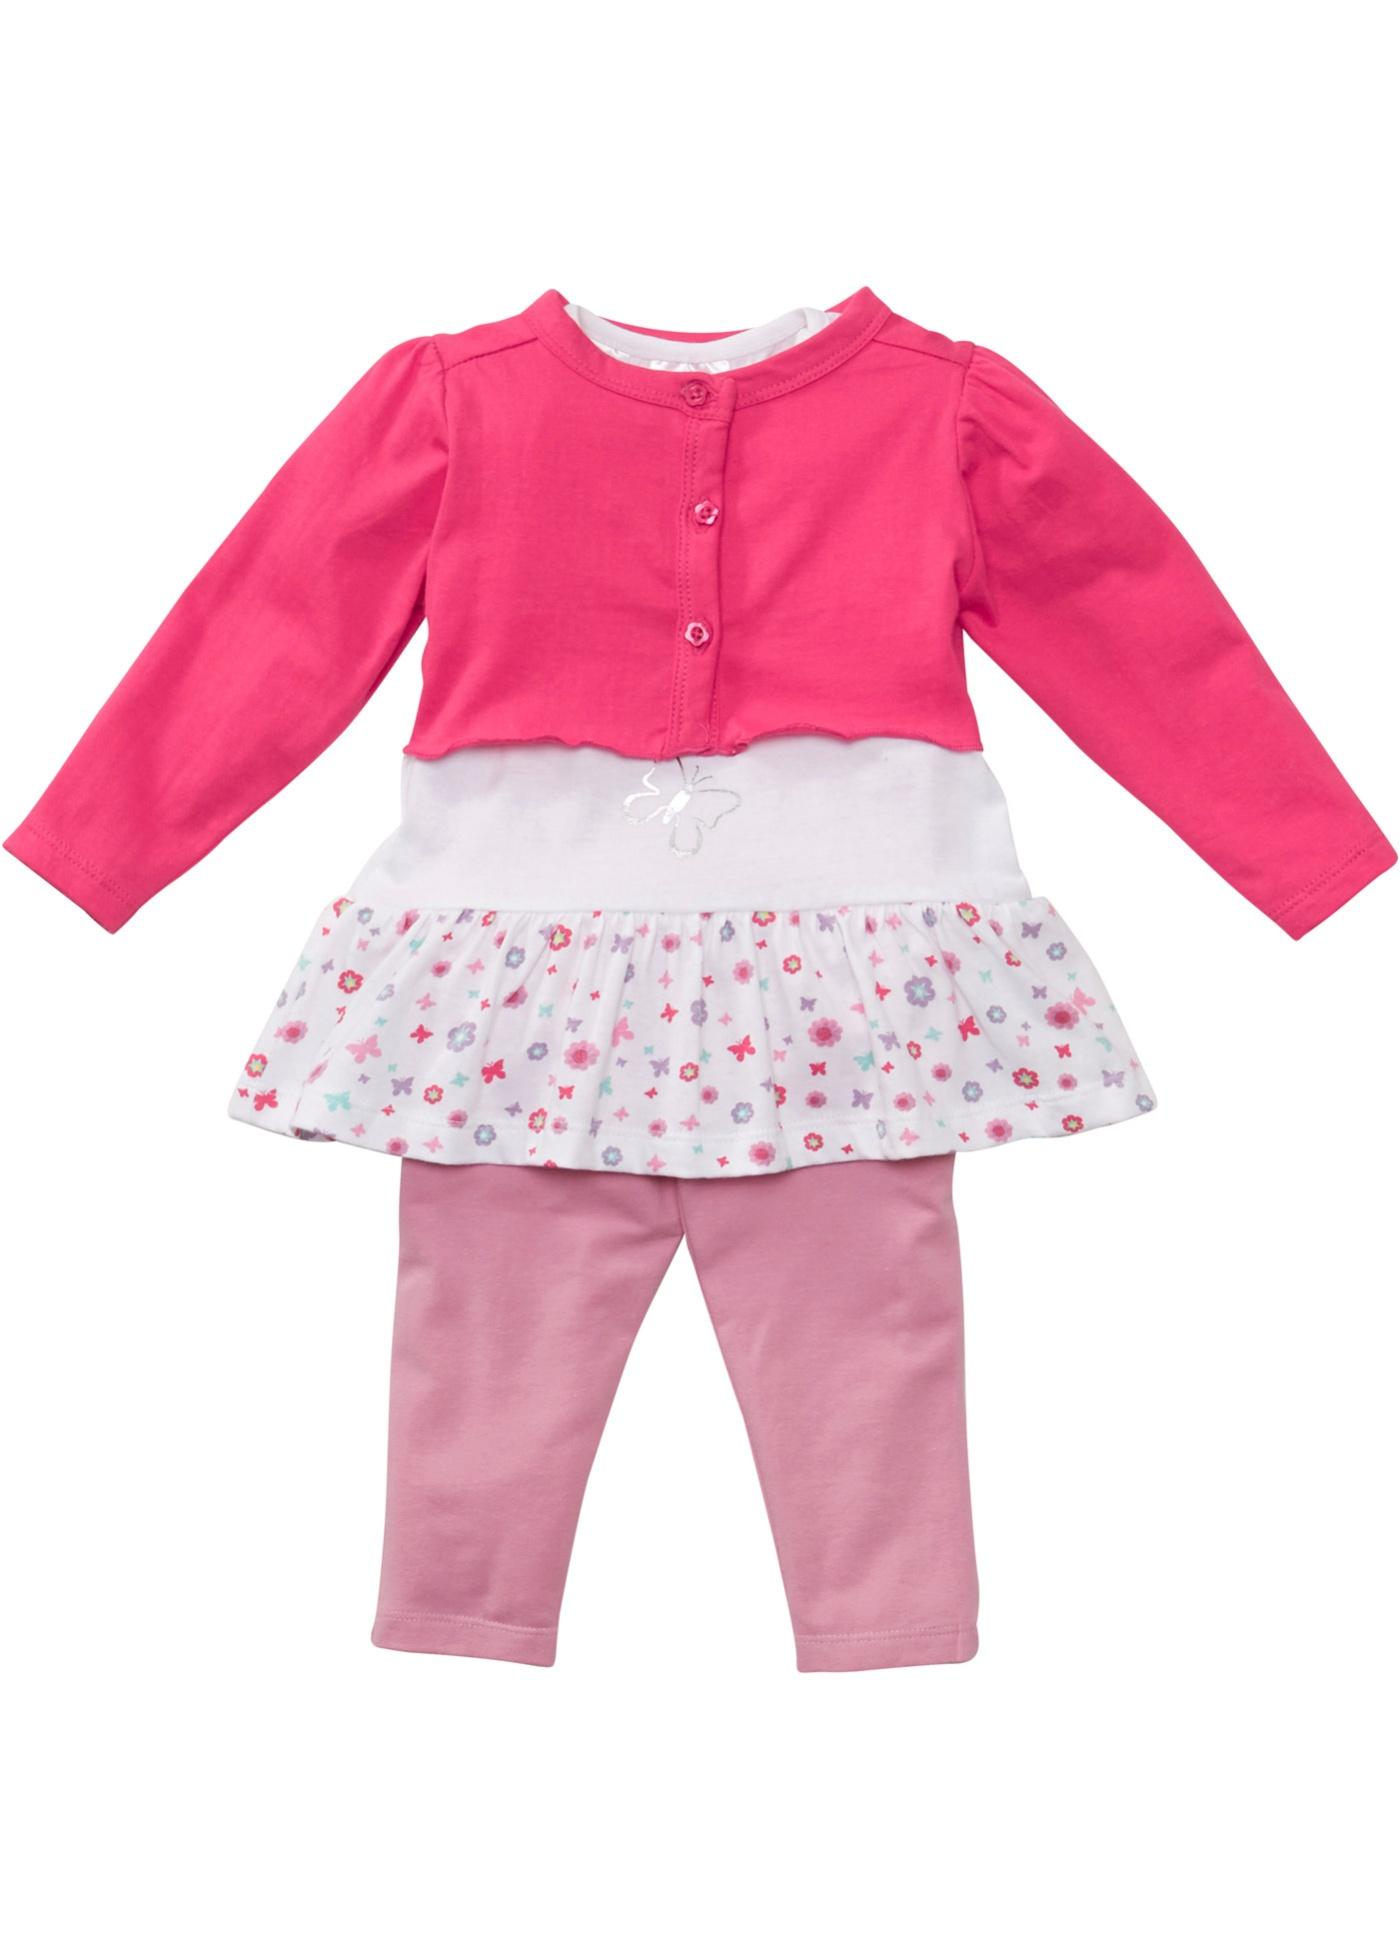 Image of Baby Bolero + T-Shirt + Leggings (3-tlg.) Bio-Baumwolle